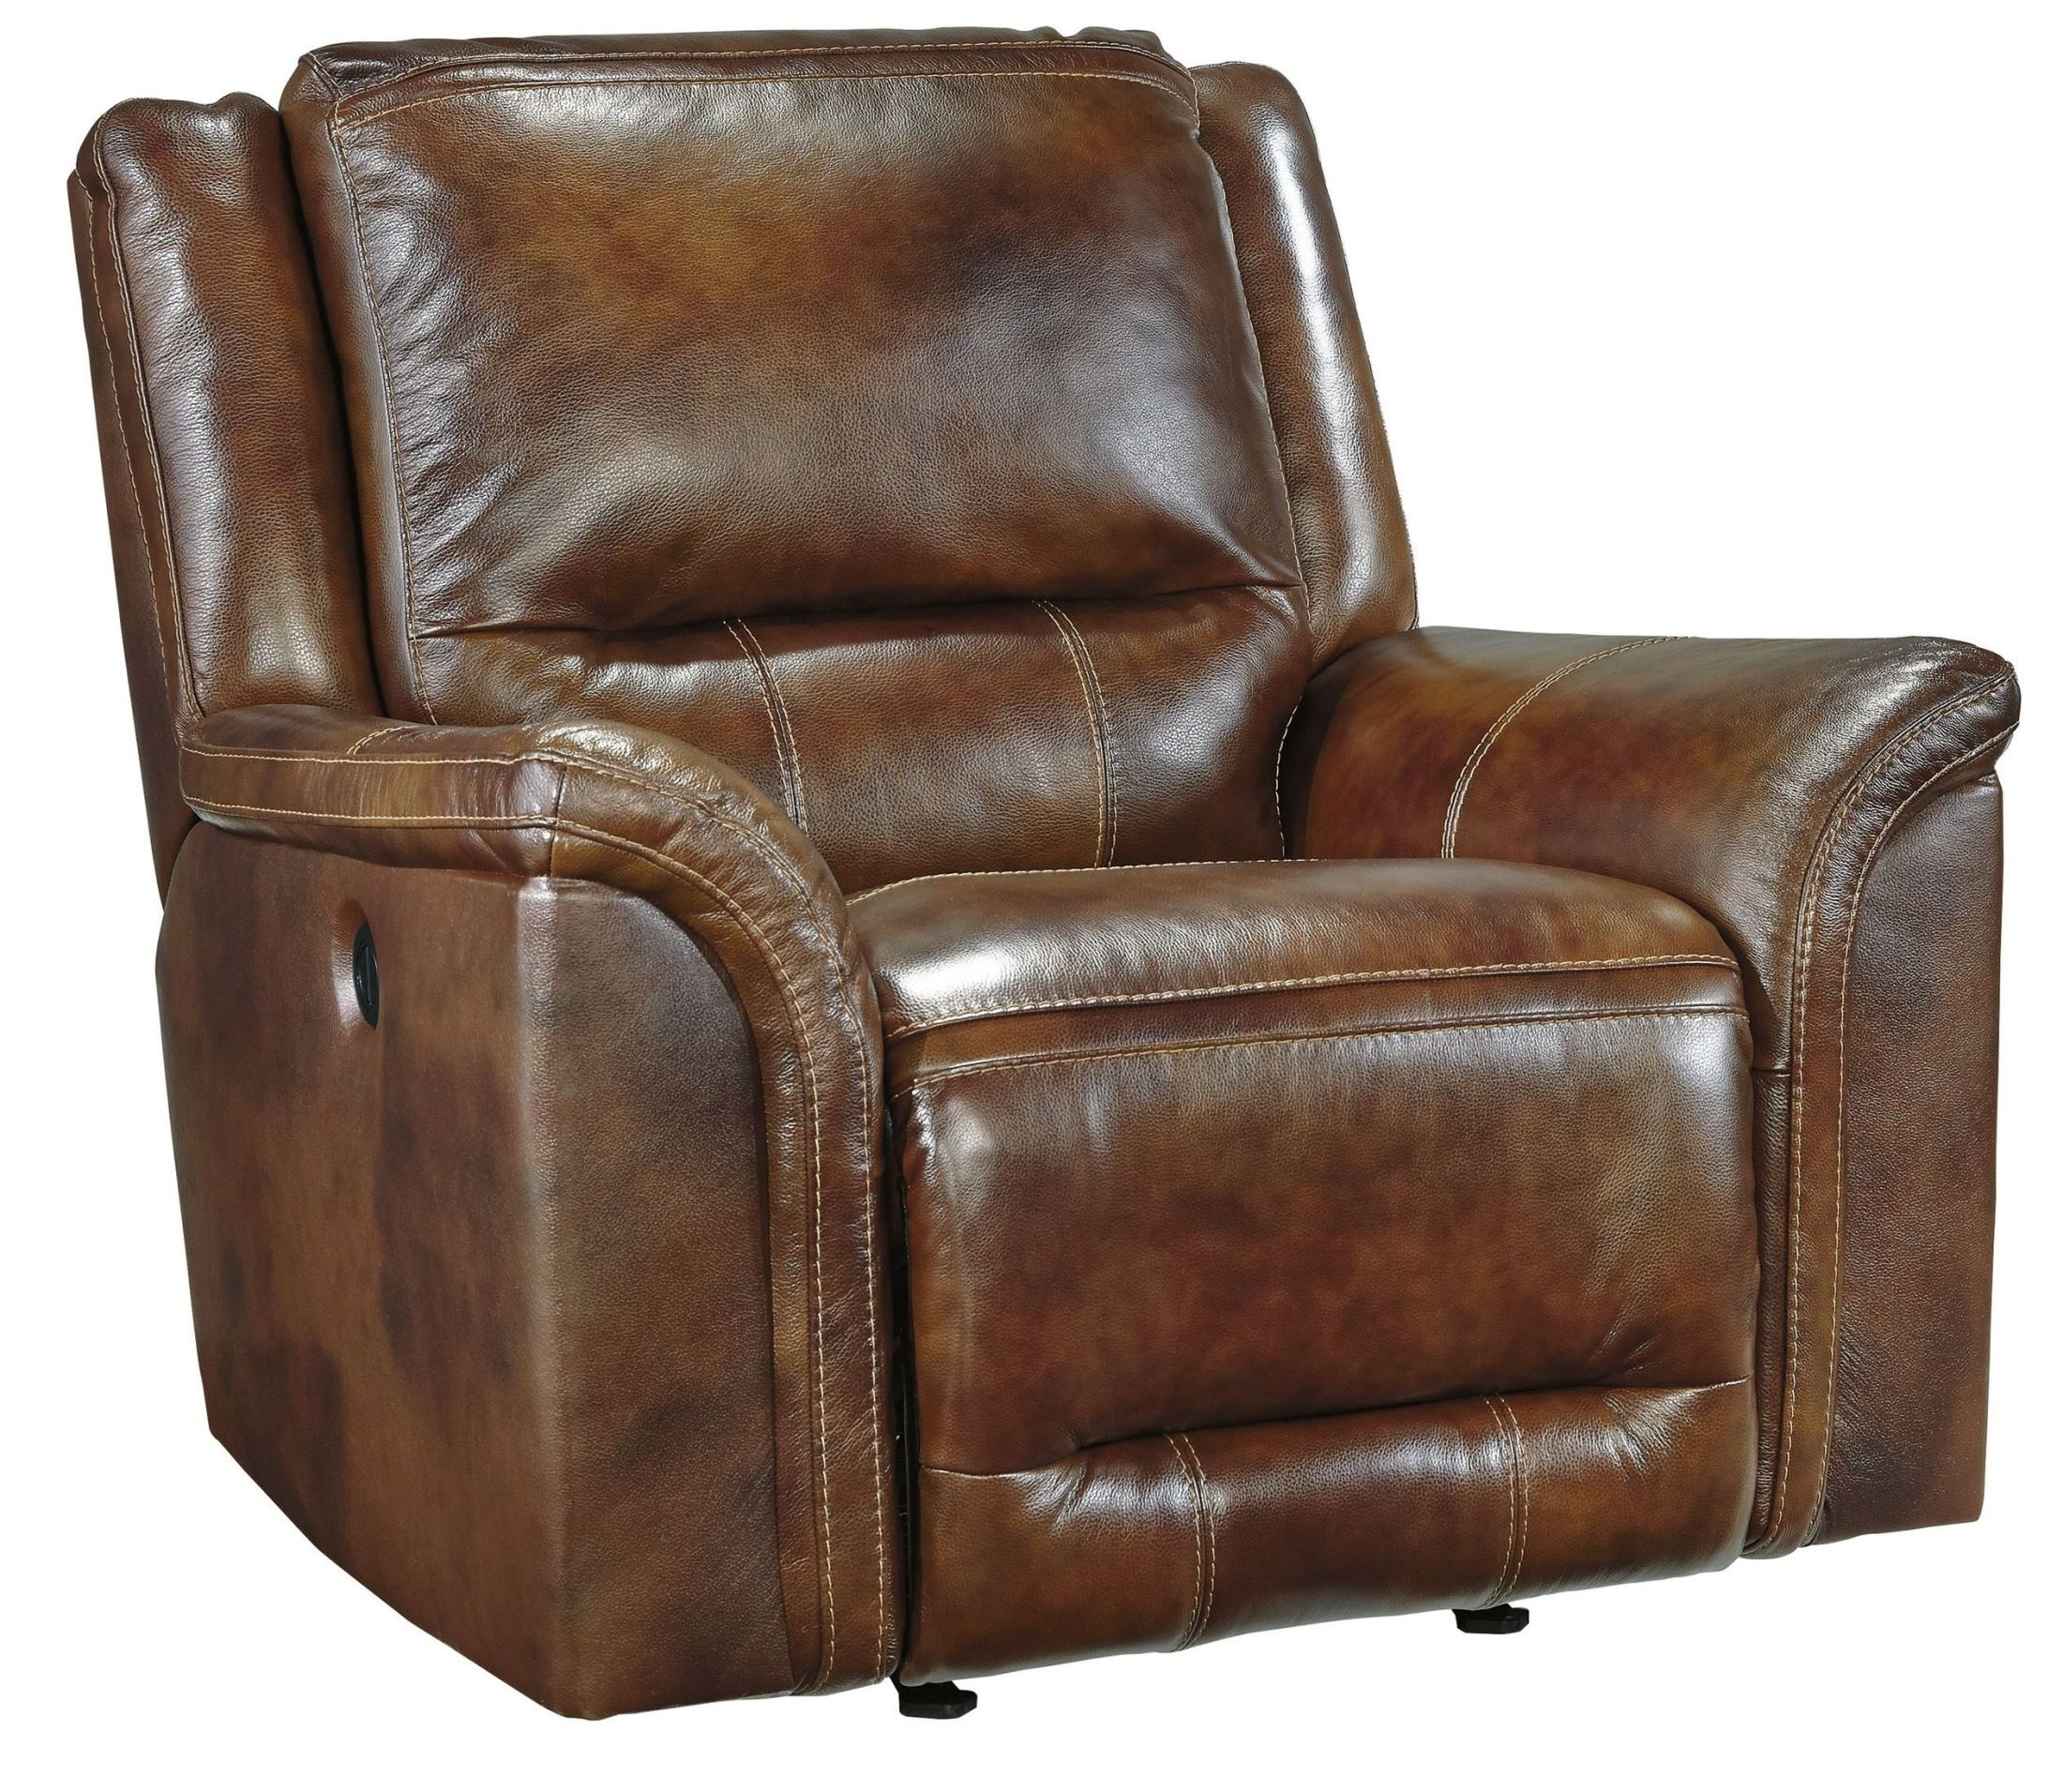 599288  sc 1 st  Coleman Furniture & Jayron Harness Power Rocker Recliner from Ashley (U7660098 ... islam-shia.org